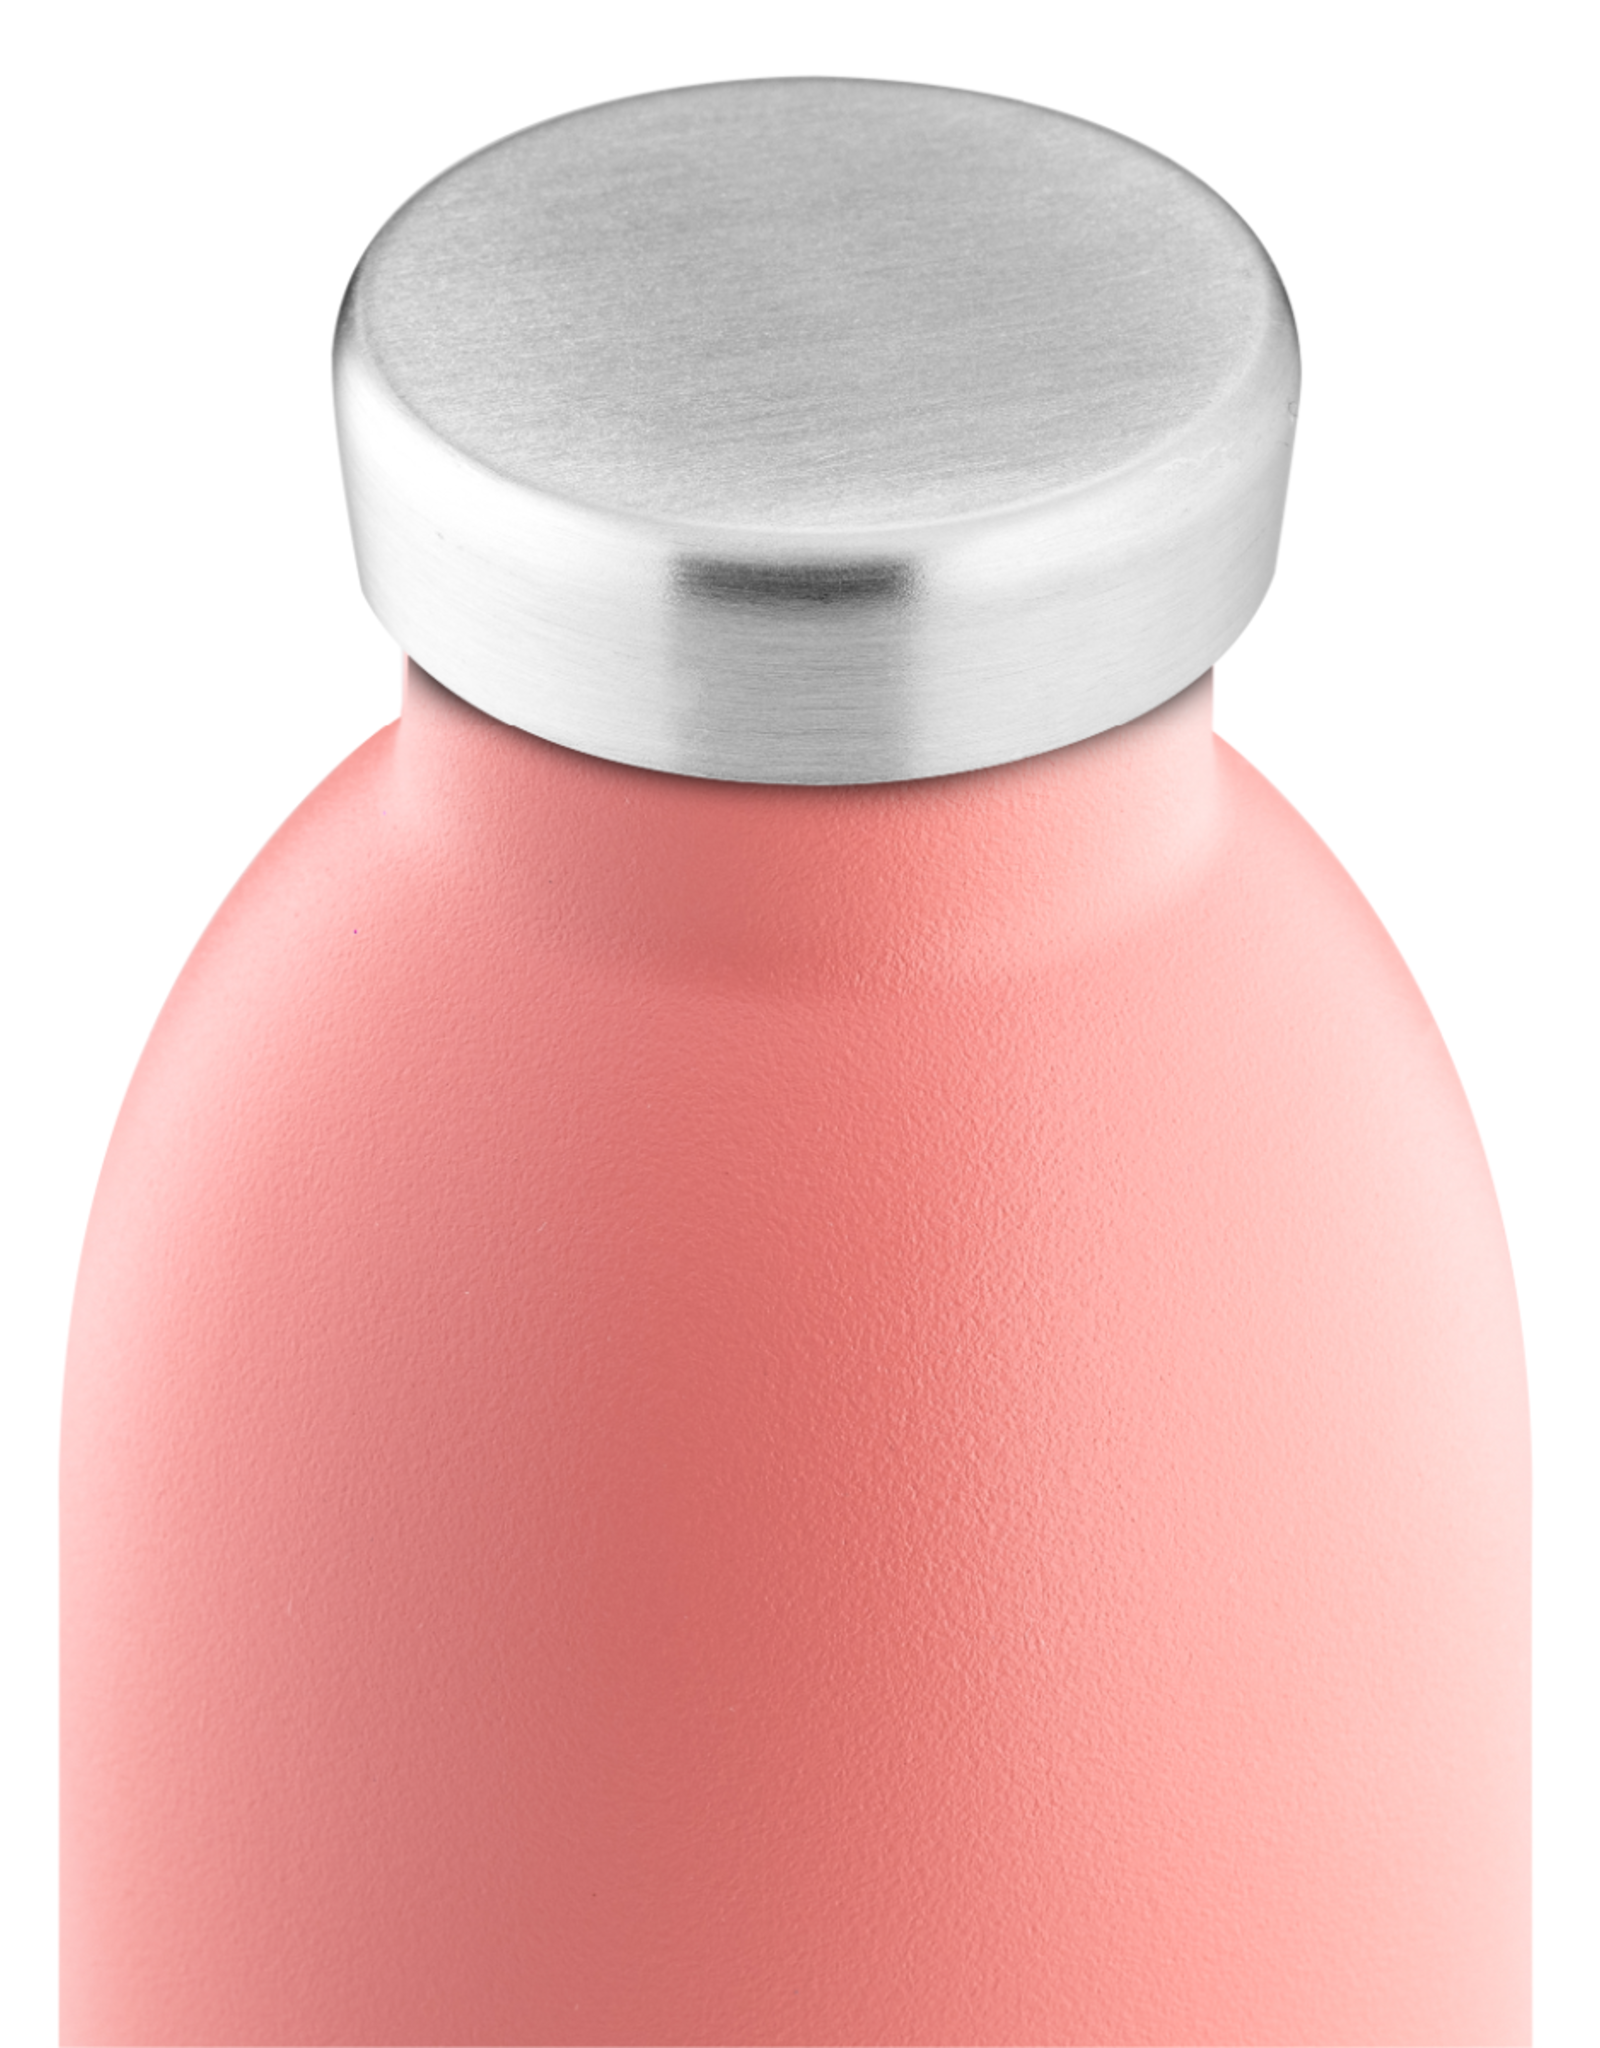 24 bottles Clima bottle - Pink blush 500 ml